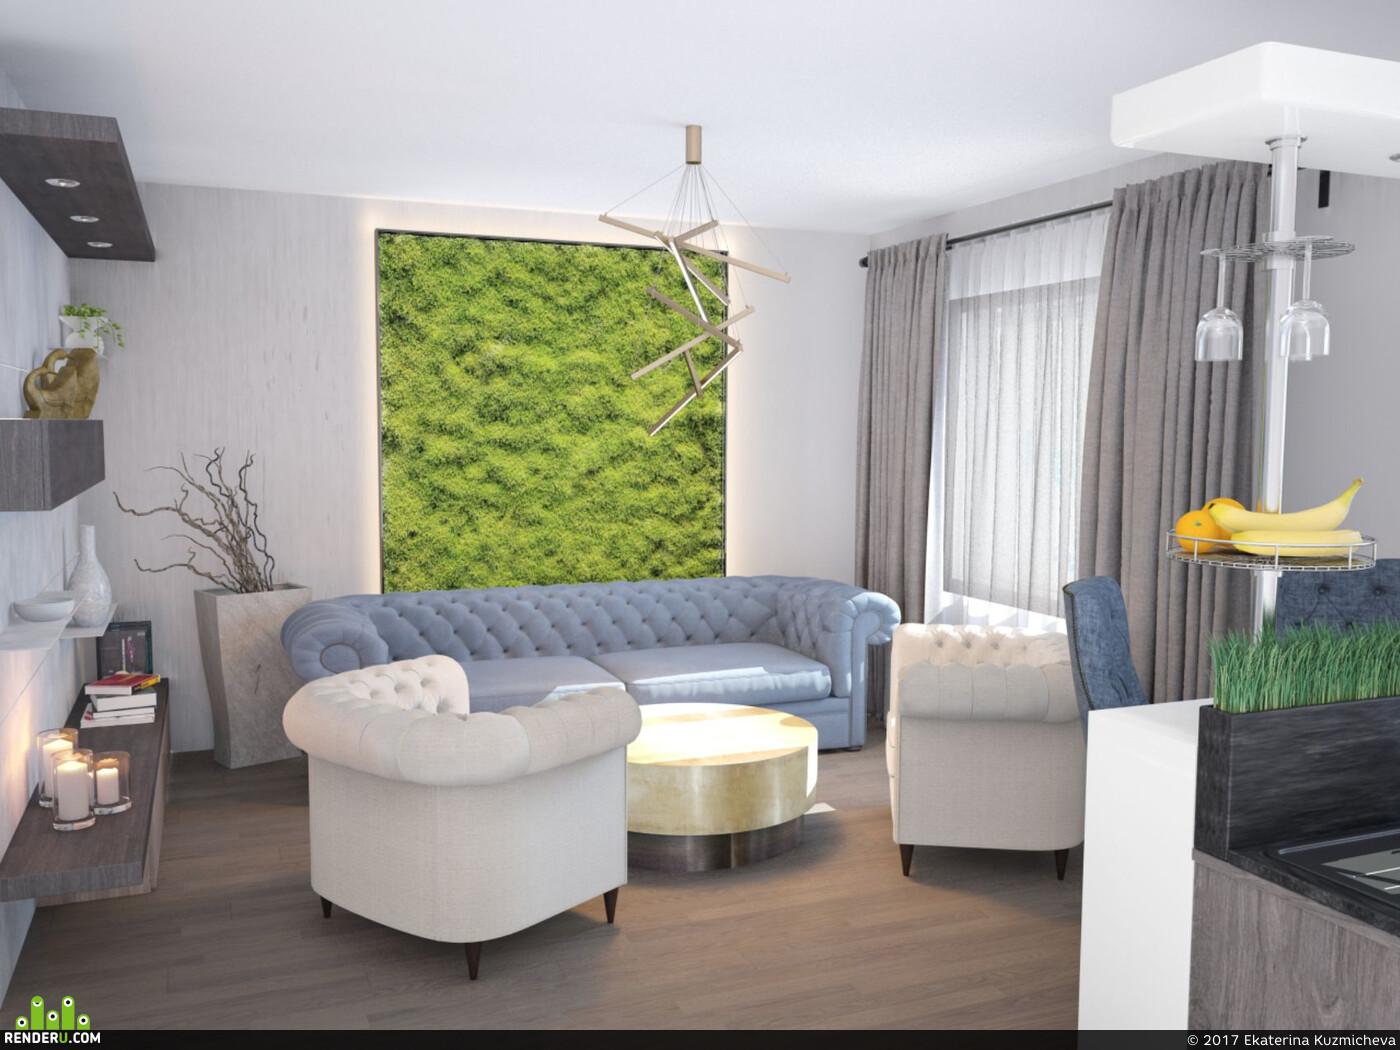 интерьер, дизайн интерьера, Интерьерная визуализация, визуализация интерьеров, 3д визуализация интерьера